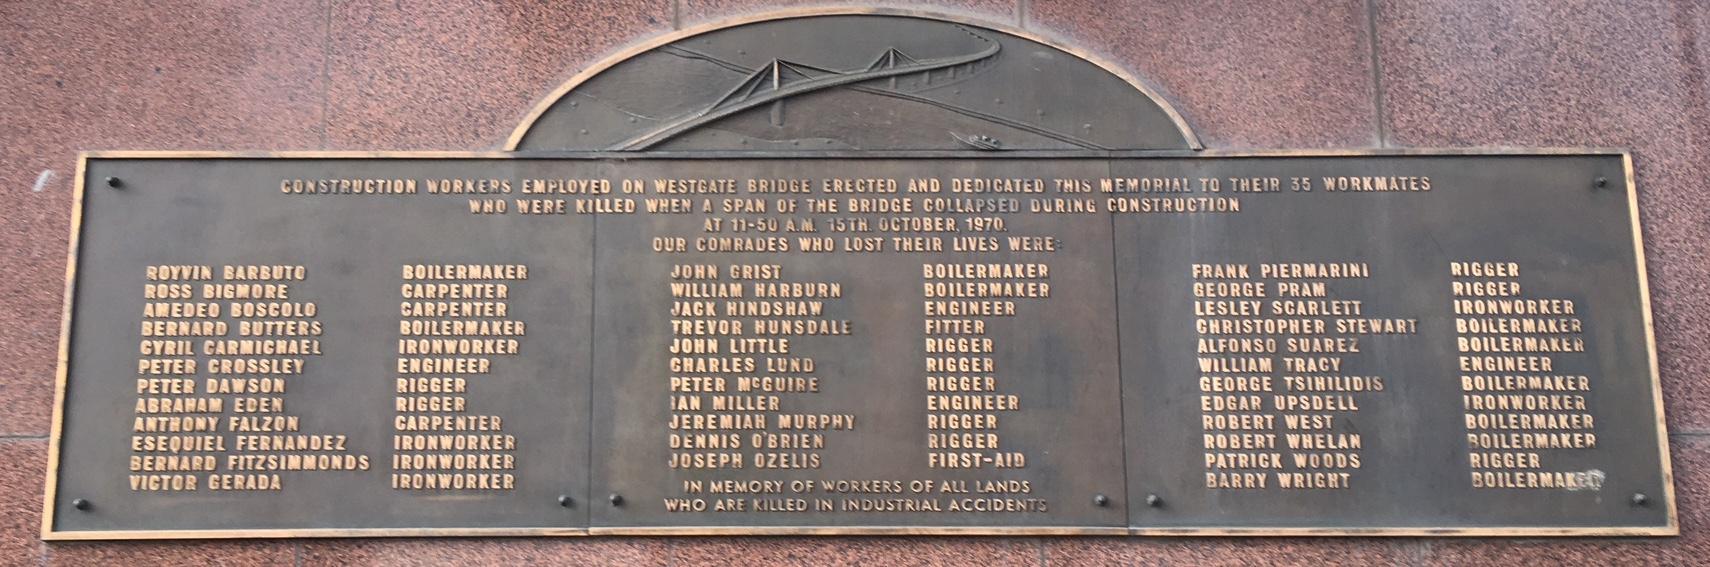 Memorial to Westgate Bridge Disaster